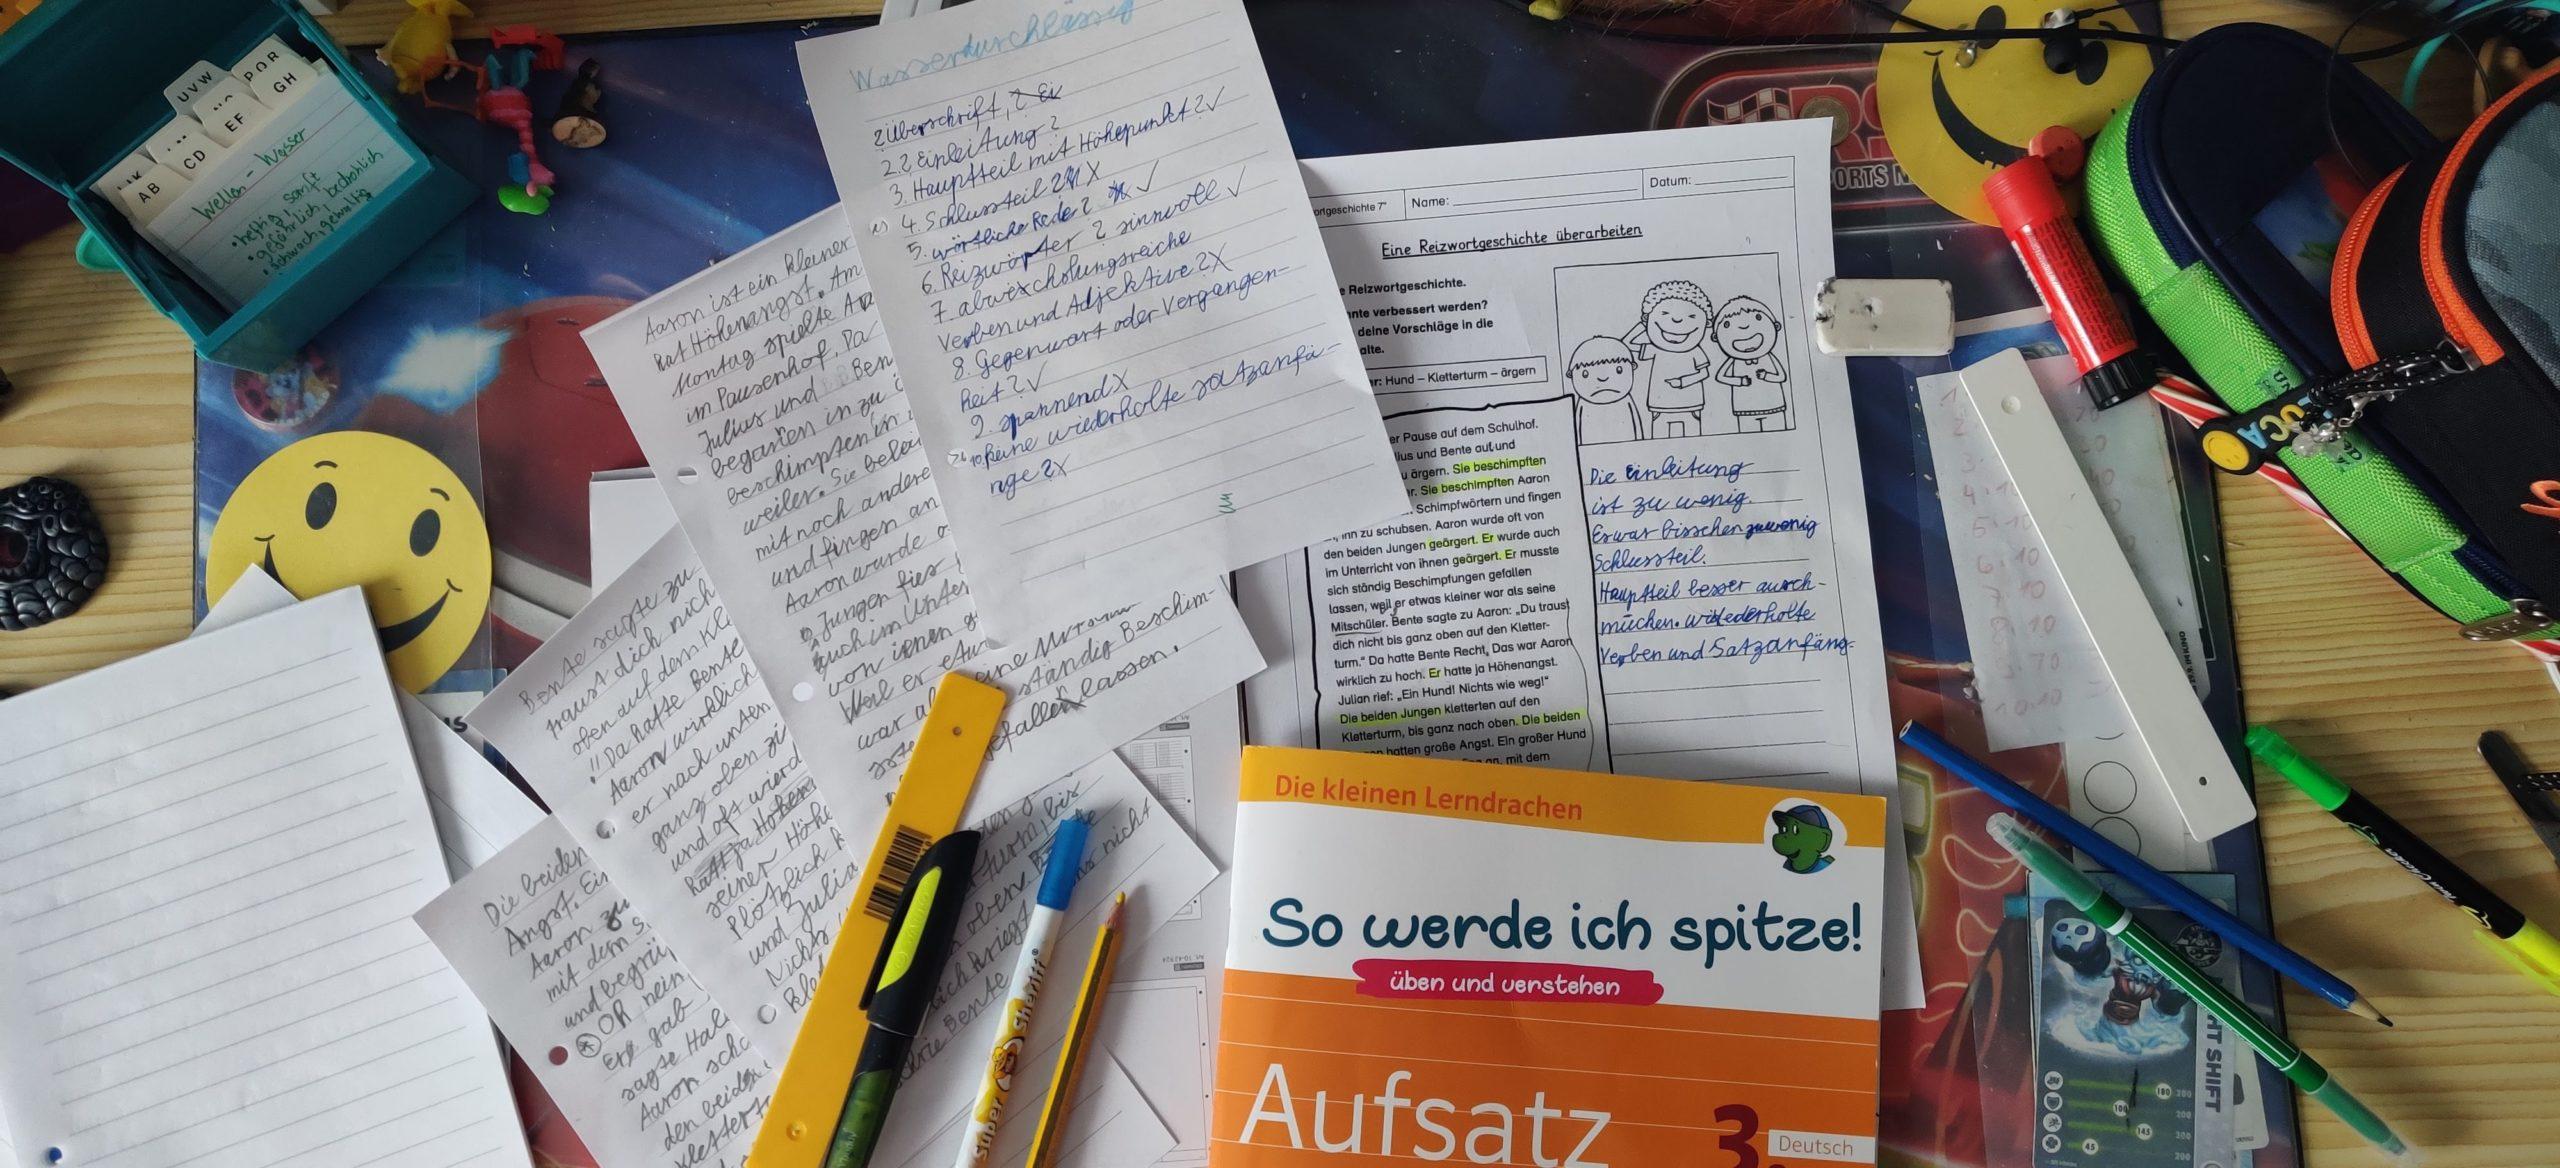 tipp-9-nerdweibweb-homeschooling-homeoffice-bueromaterial-unterlagen